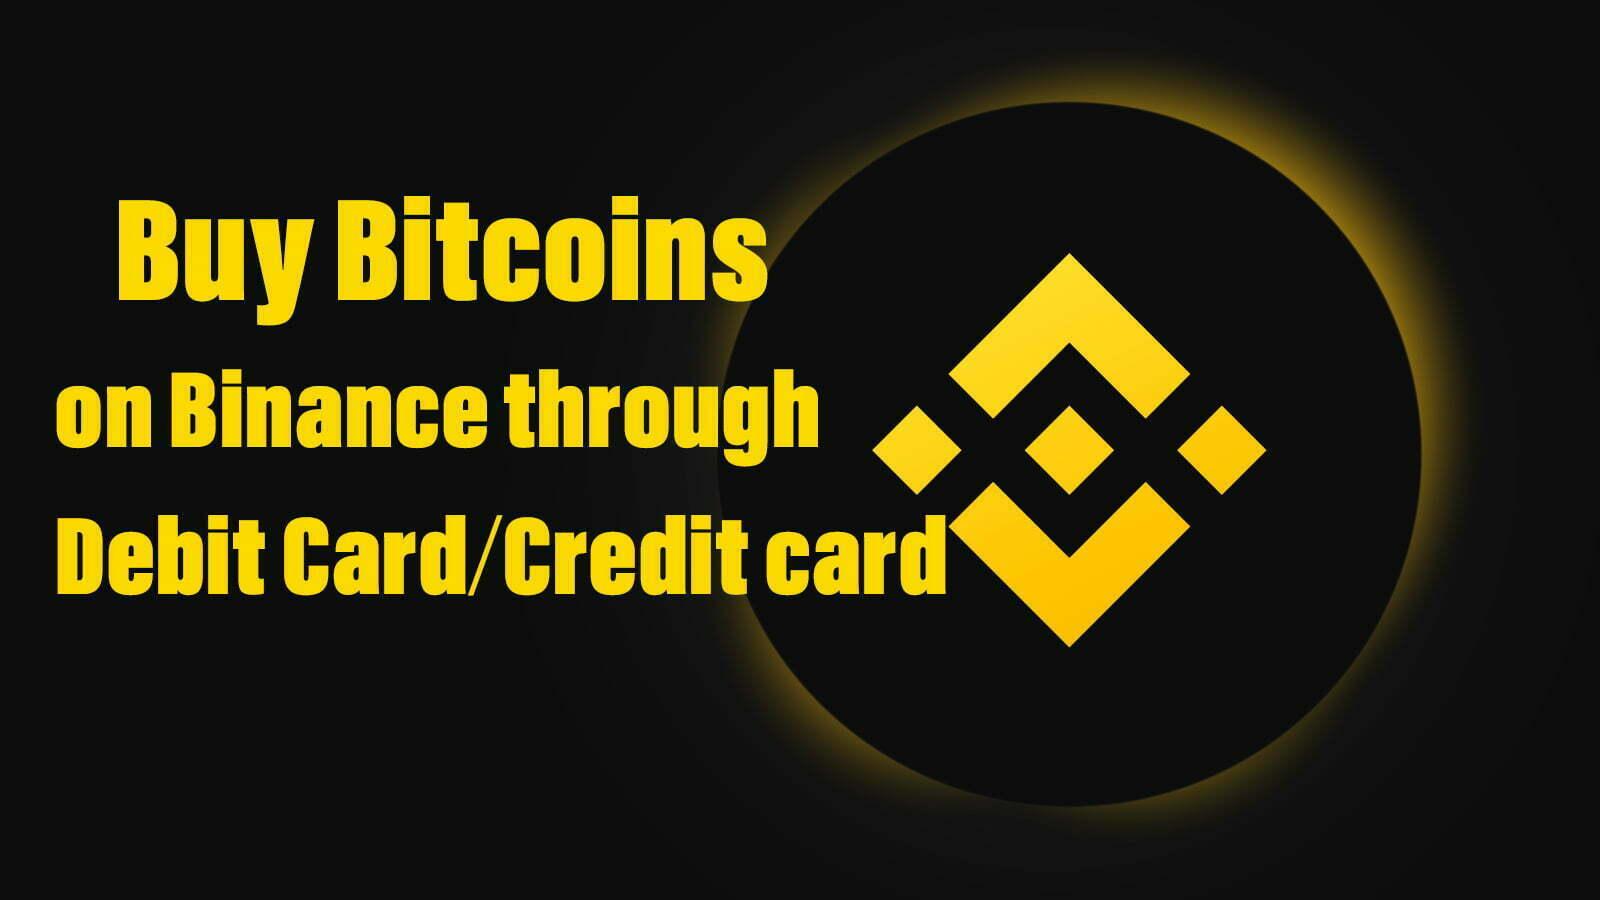 How to Buy Bitcoins on Binance through Debit Card/Credit card